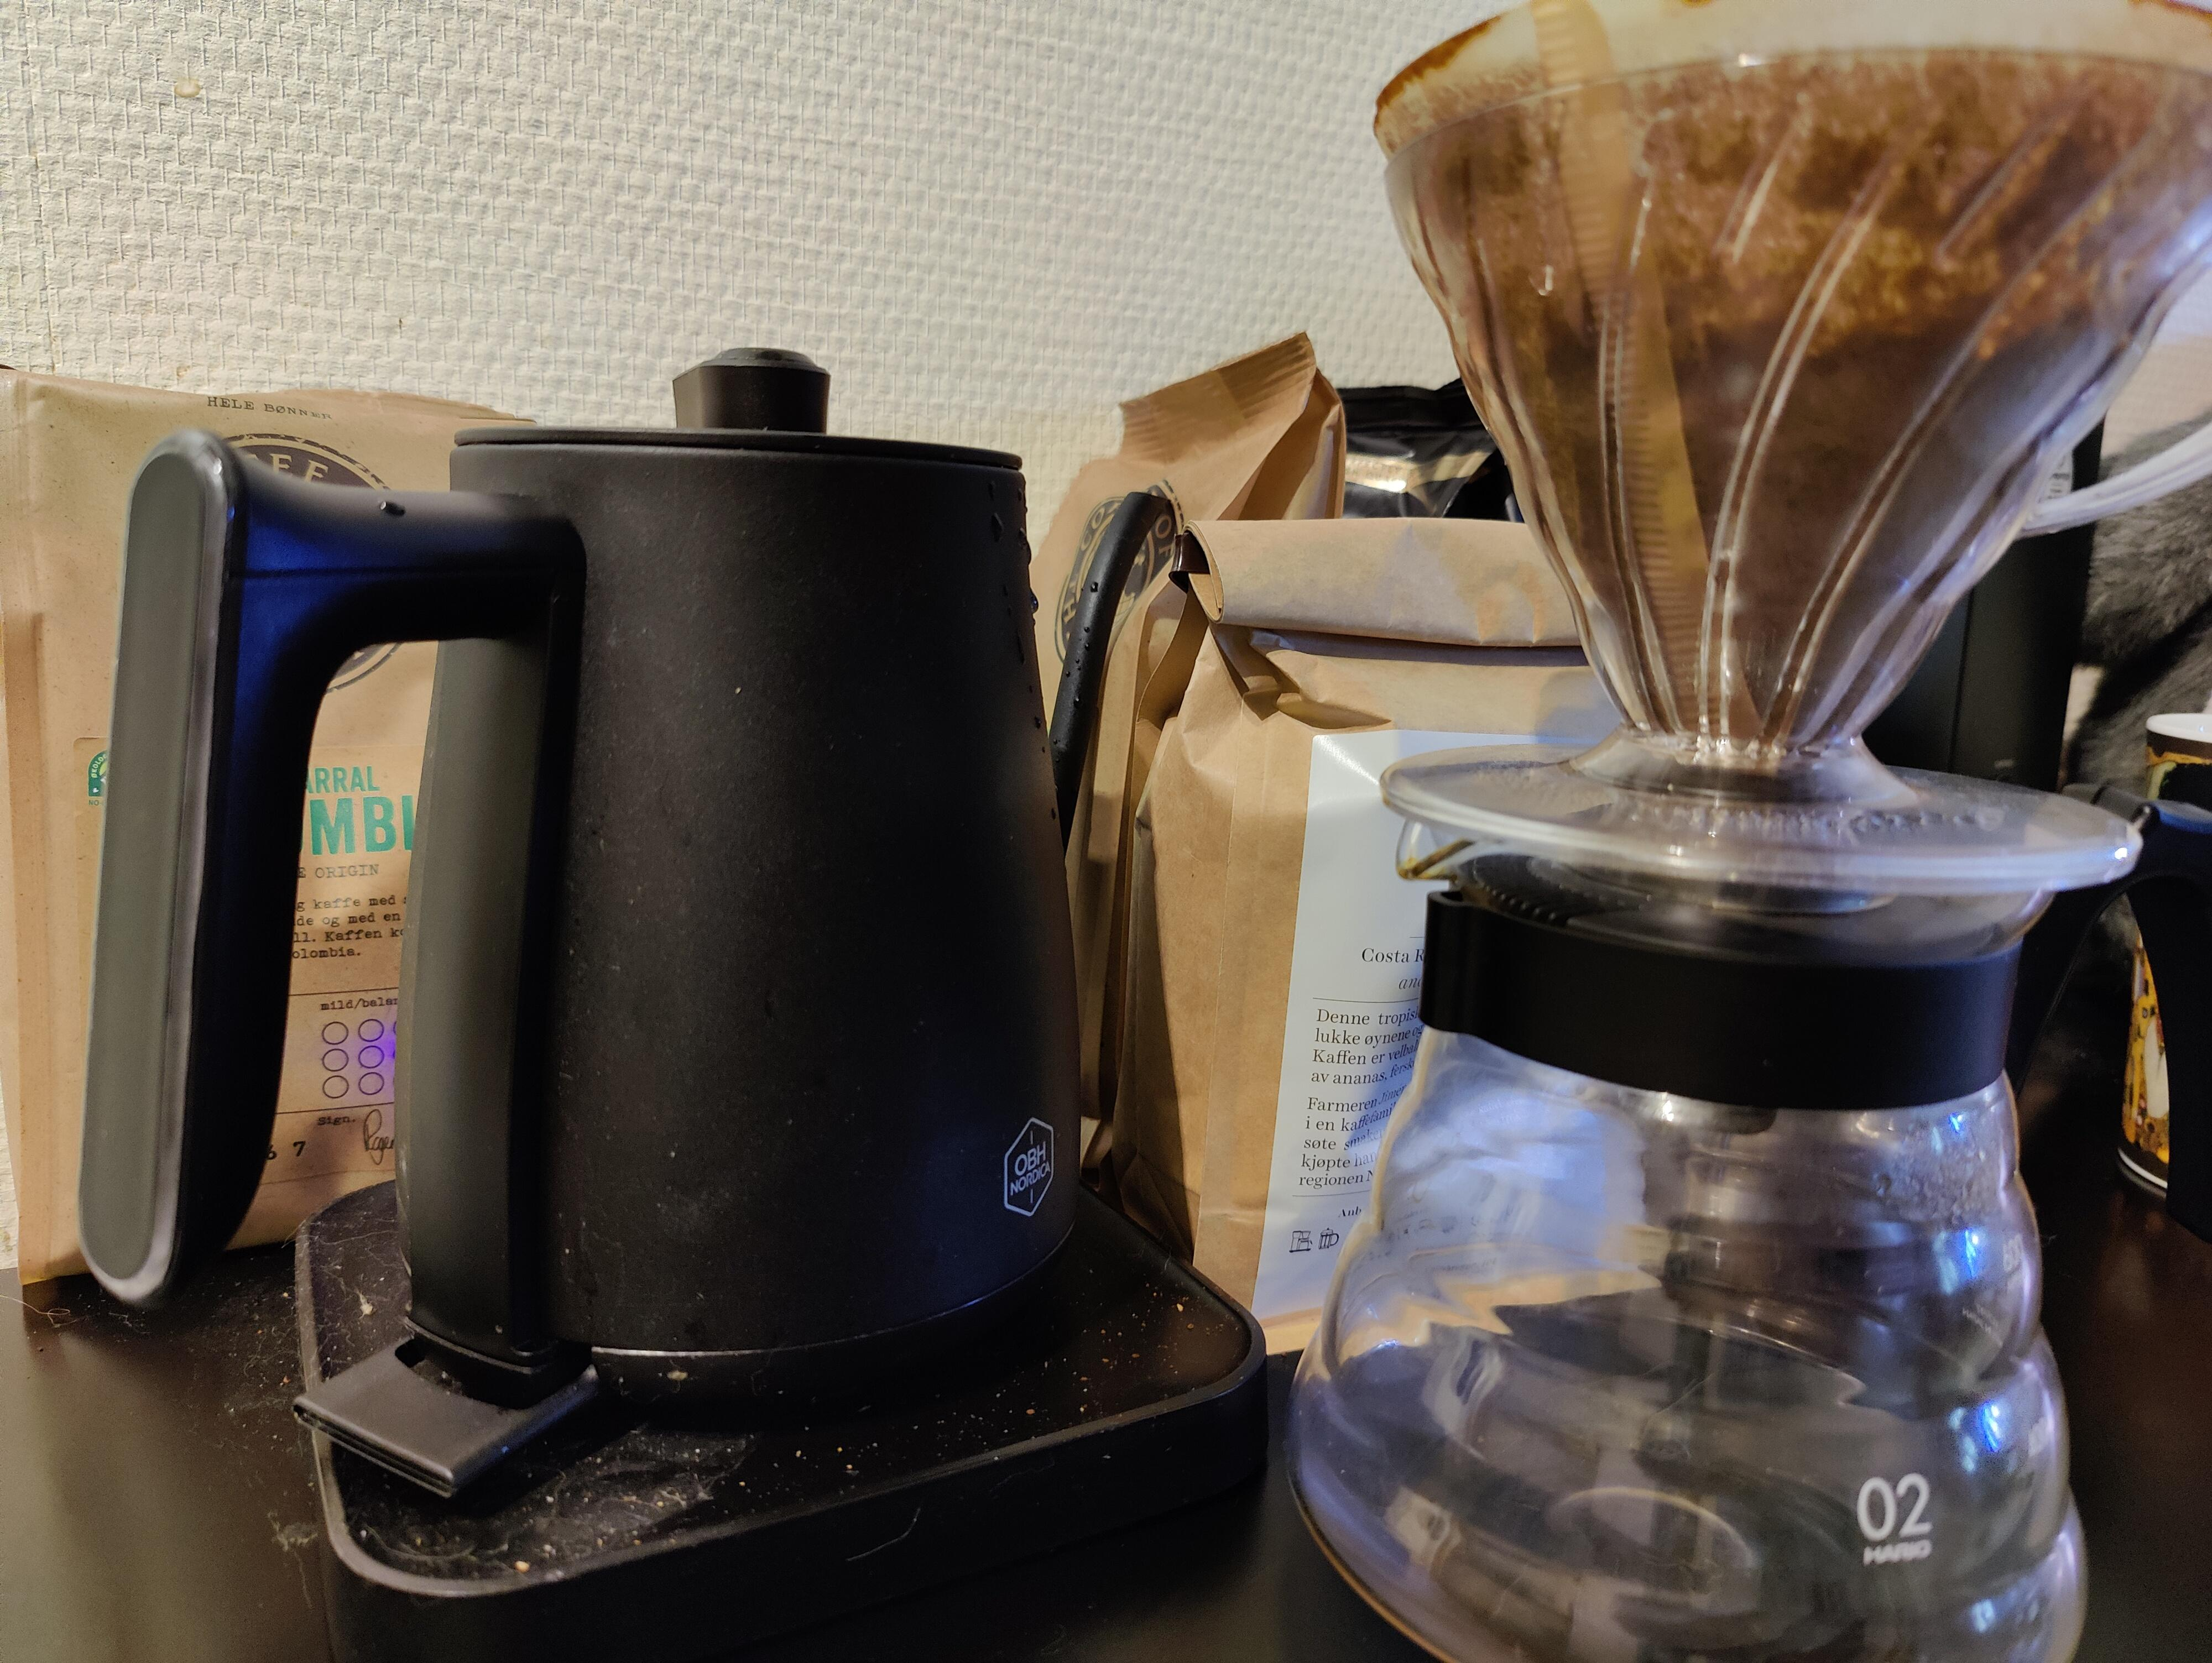 Kaffekaffekaffe.